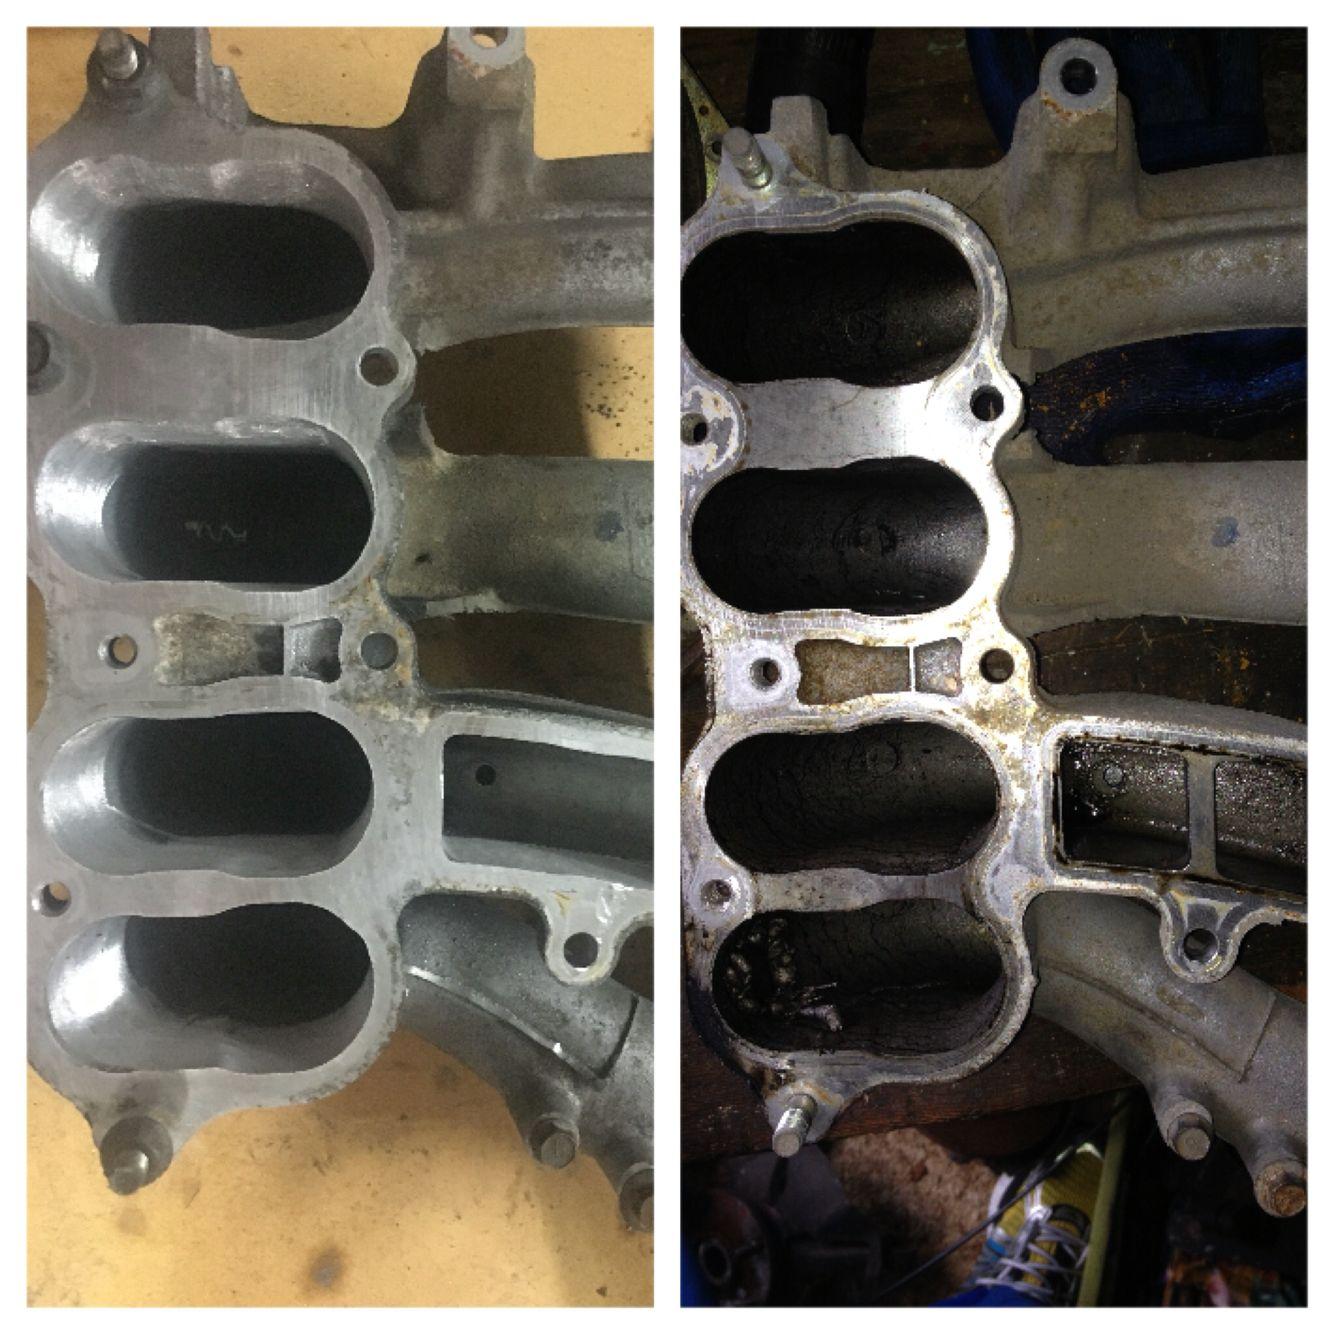 Pin on Mazda 323 Astina BG Modifications